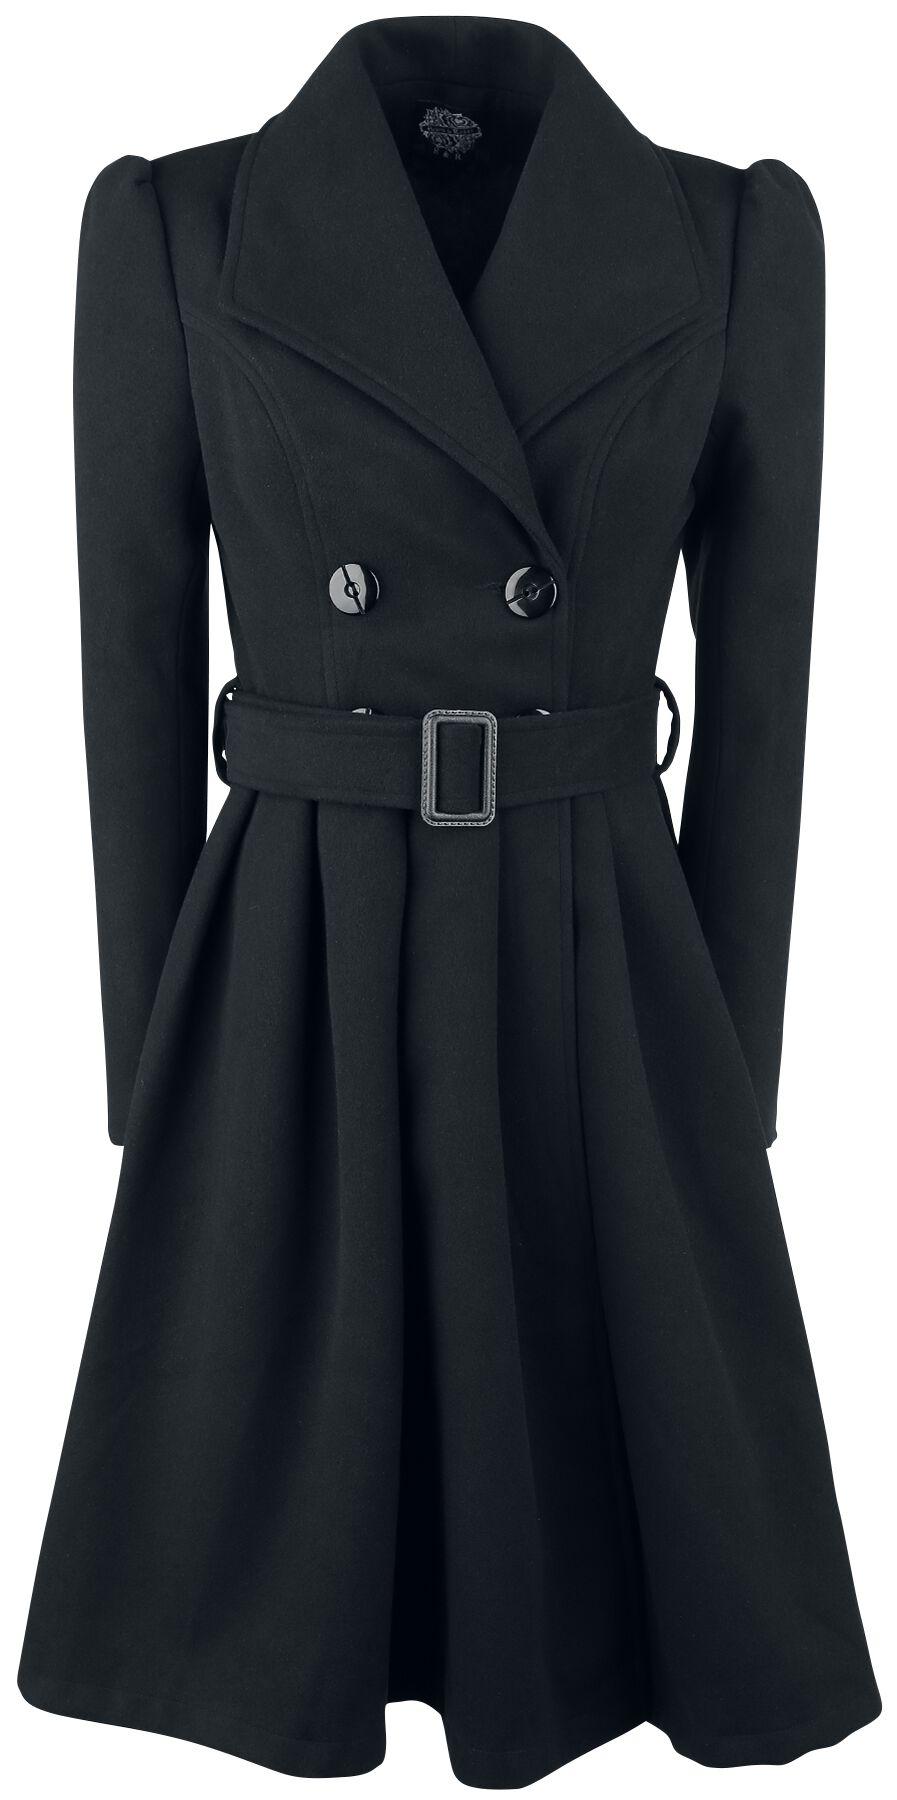 Jacken - H R London Black Vintage Swing Coat Wintermantel schwarz  - Onlineshop EMP